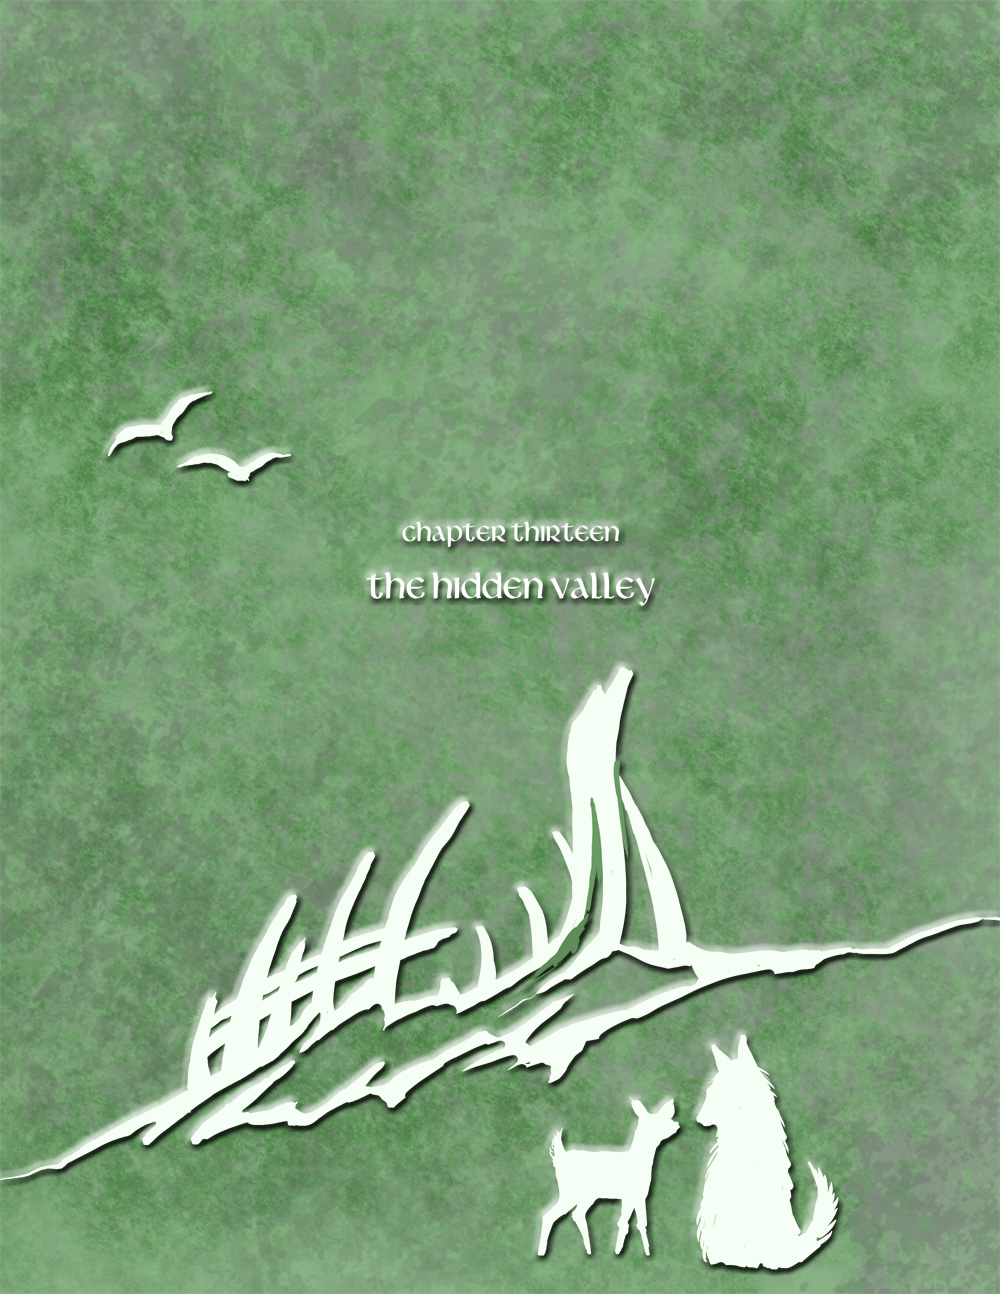 Chapter Thirteen cover